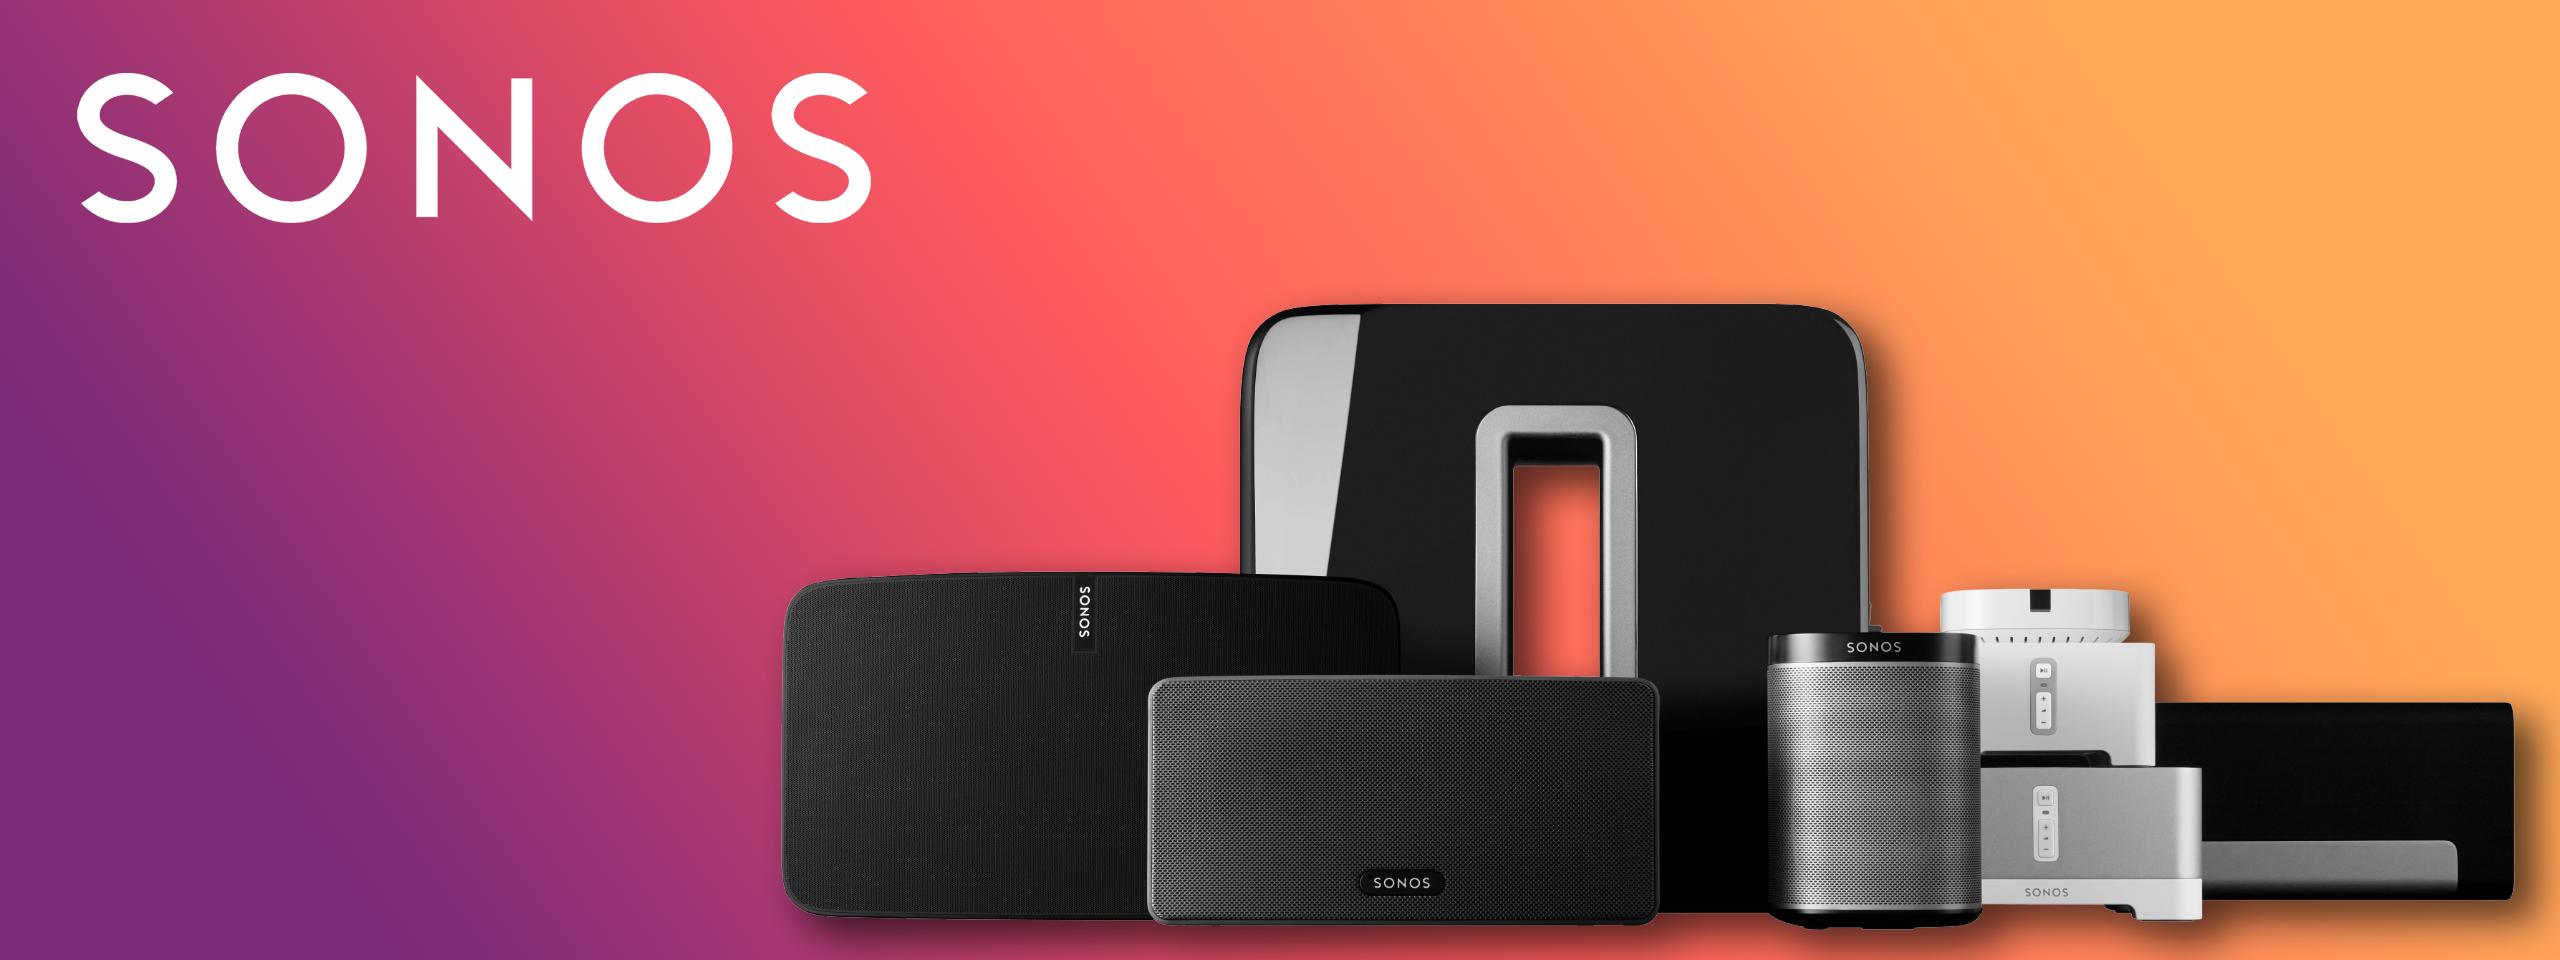 Sonos Speaker Systems